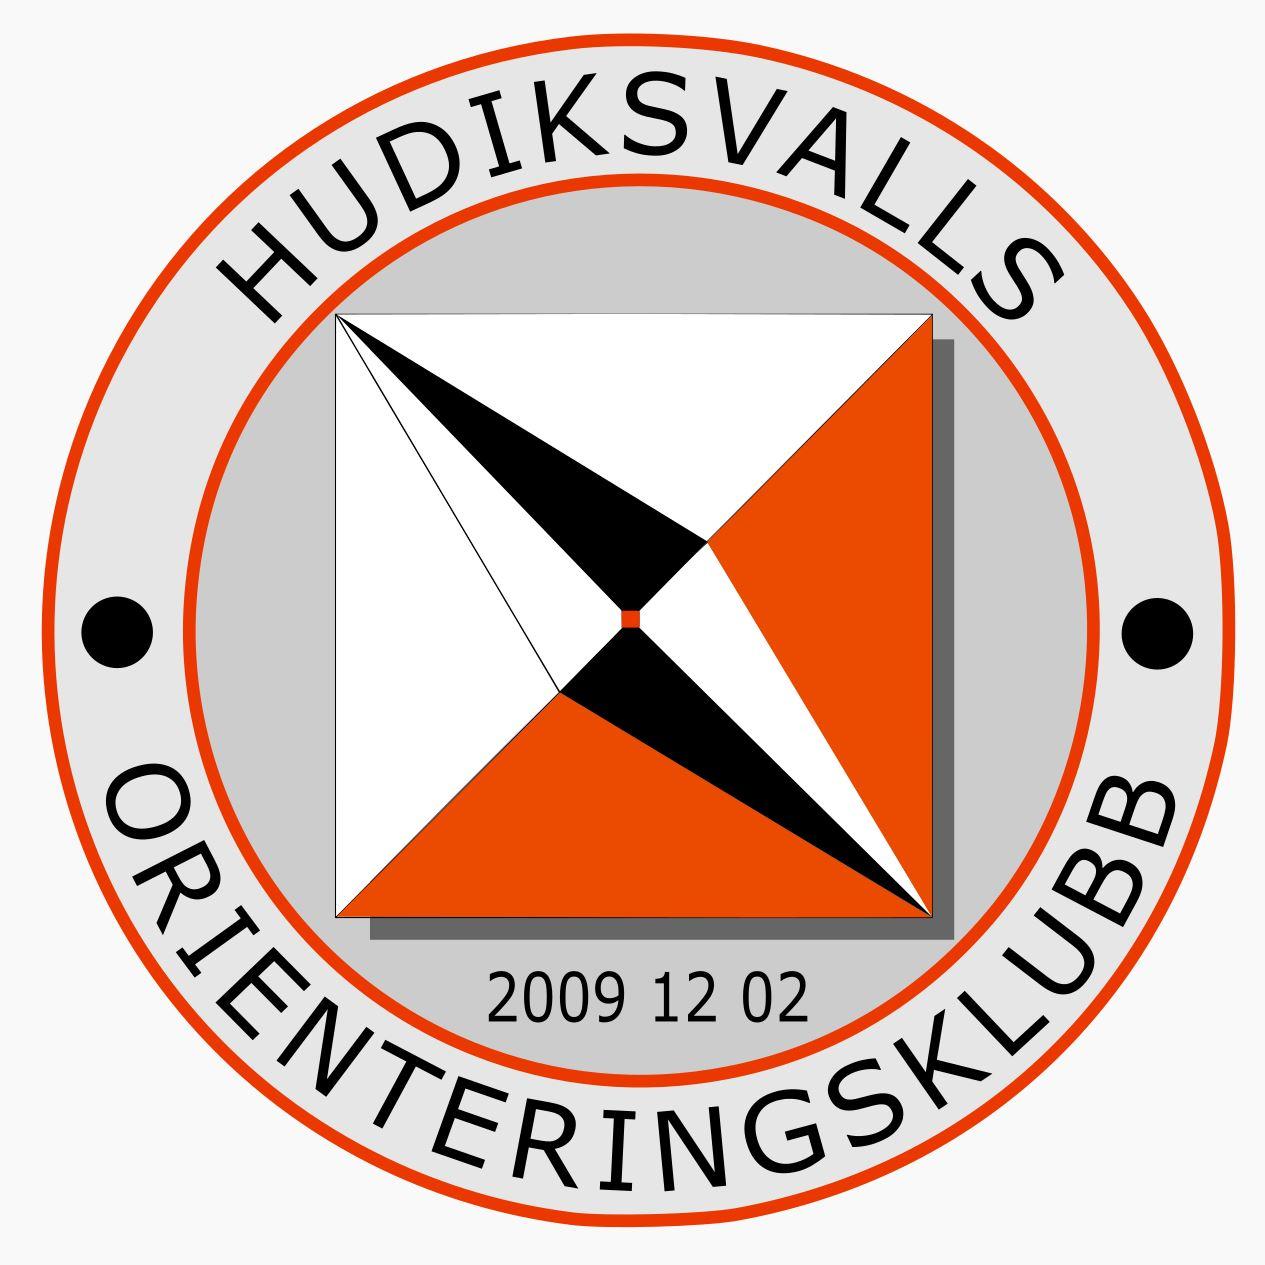 © Hudiksvalls OK, World Orienteering Day - Orienteringens dag